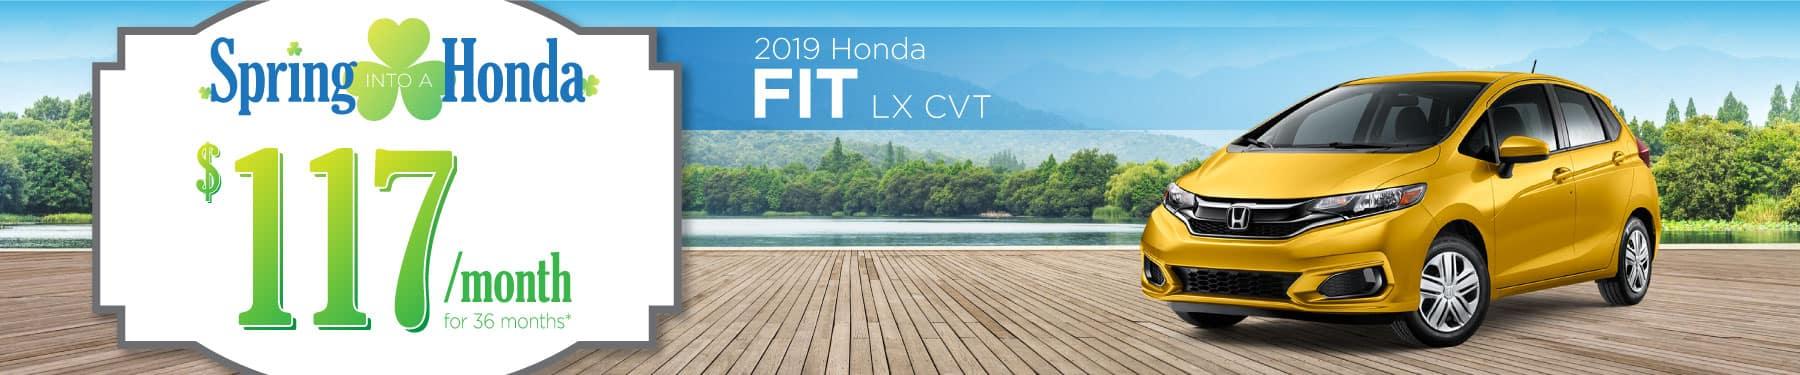 Header Photo of the 2019 Honda Fit